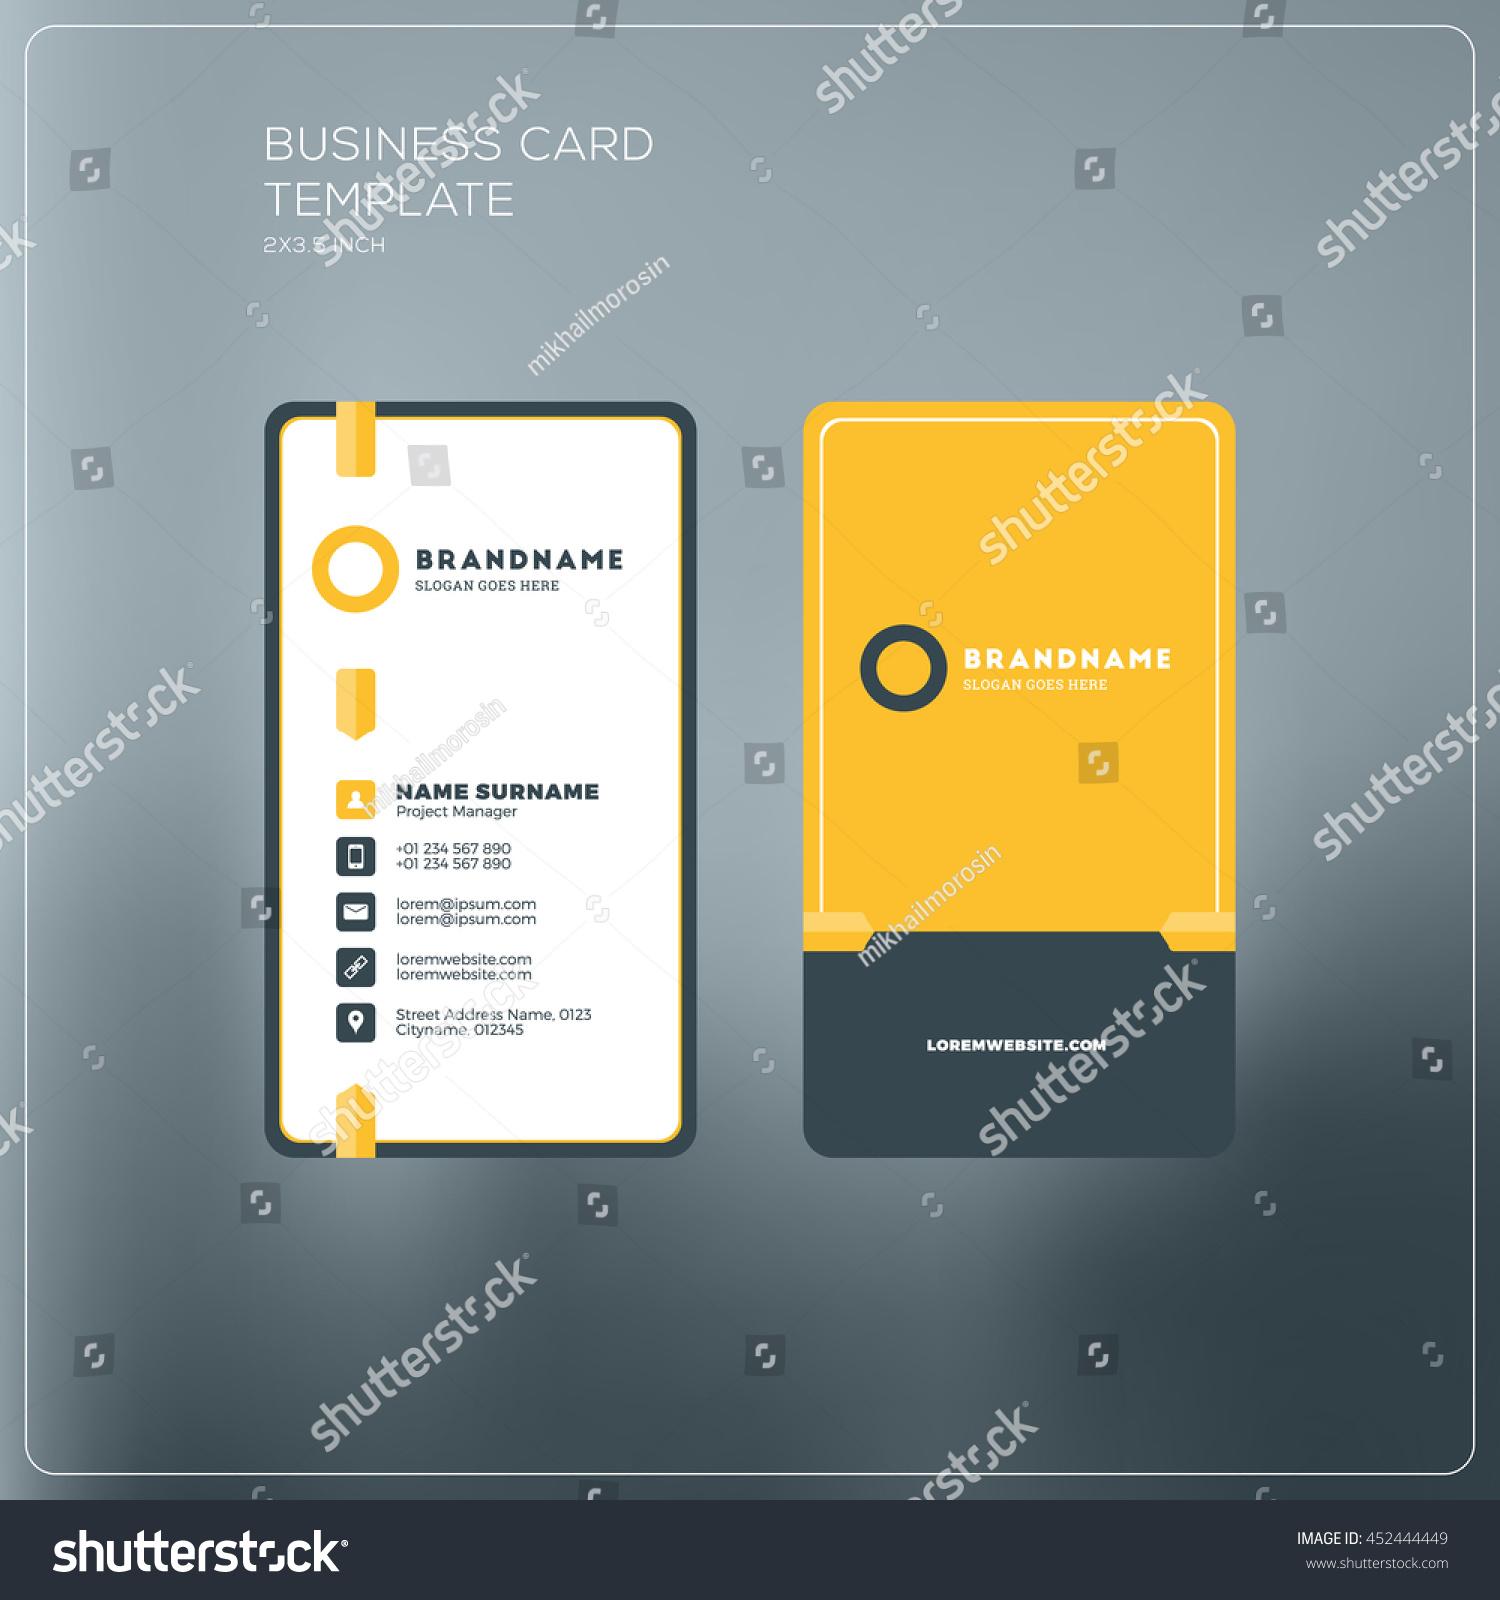 Vertical Business Card Template Eliolera